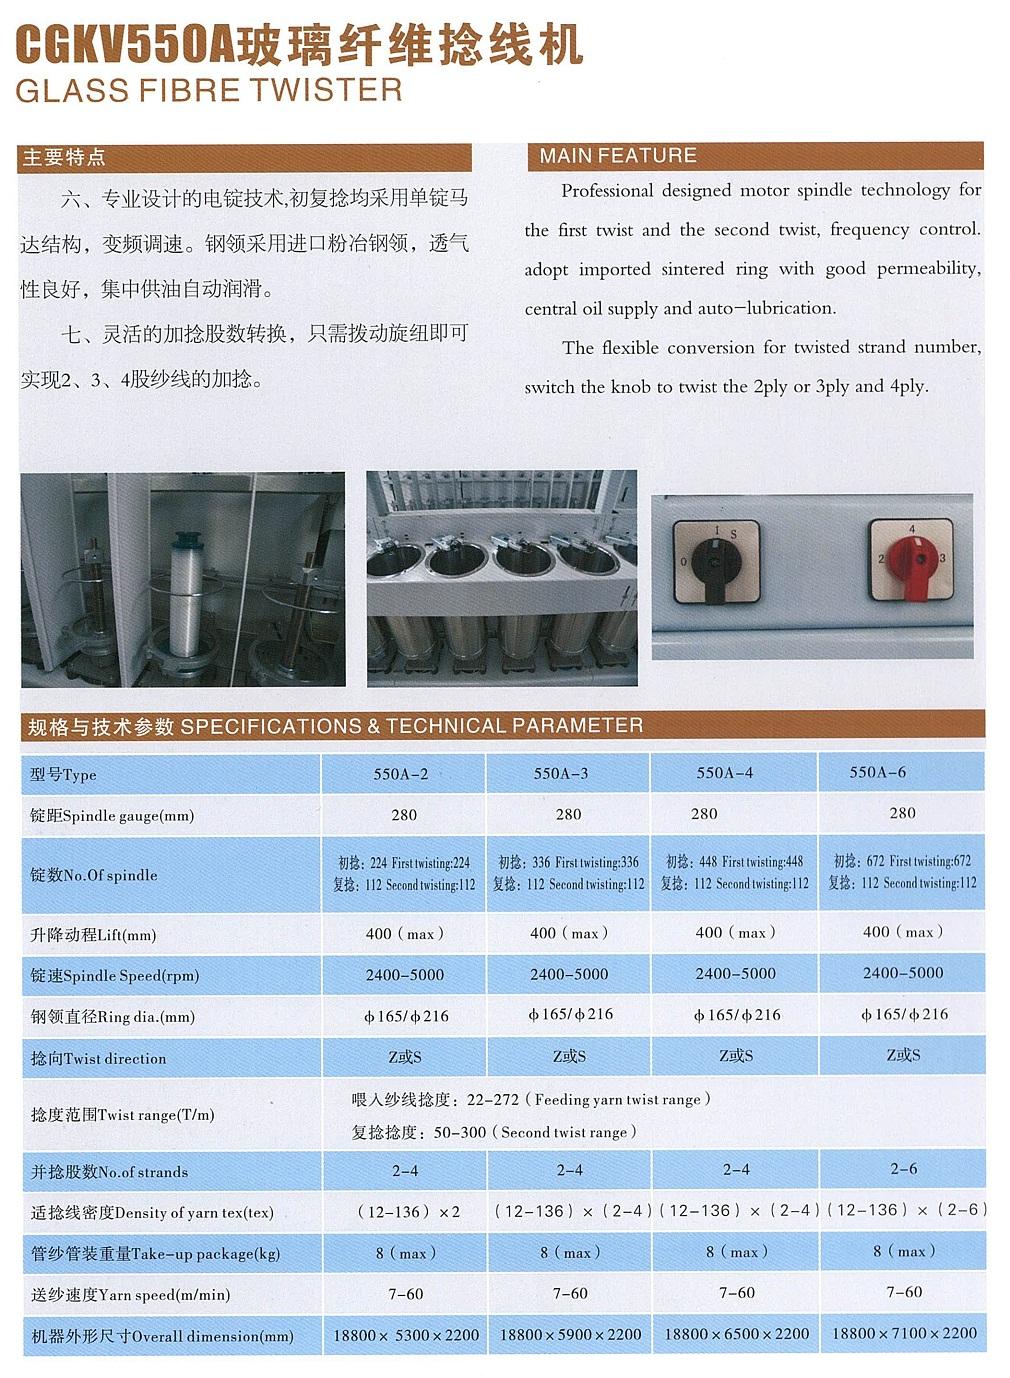 CGKV550A产品详情三